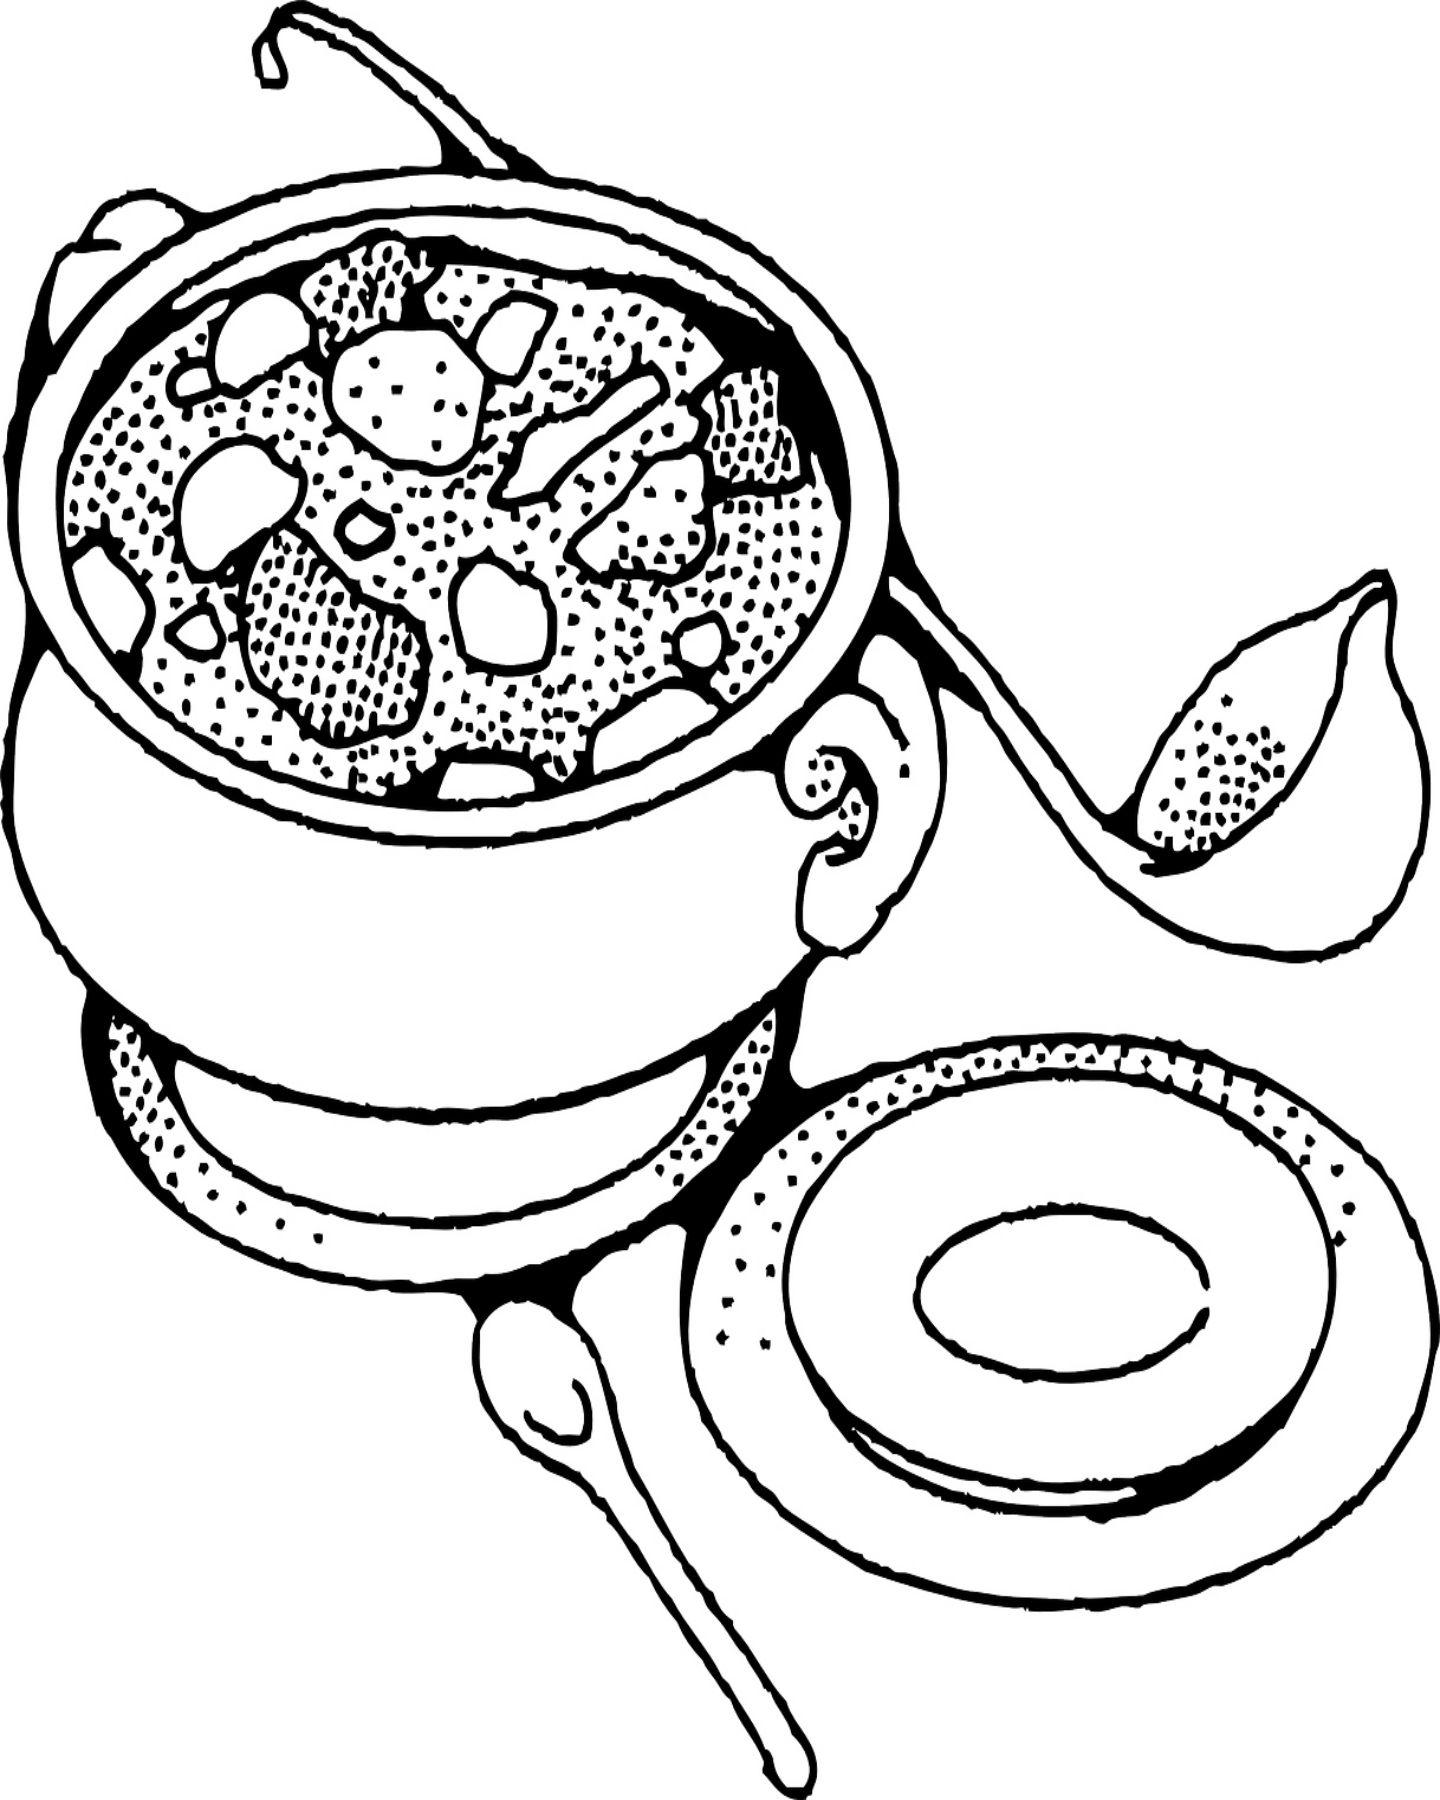 1440x1800 Free Printable Soup Coloring Page Soups Free